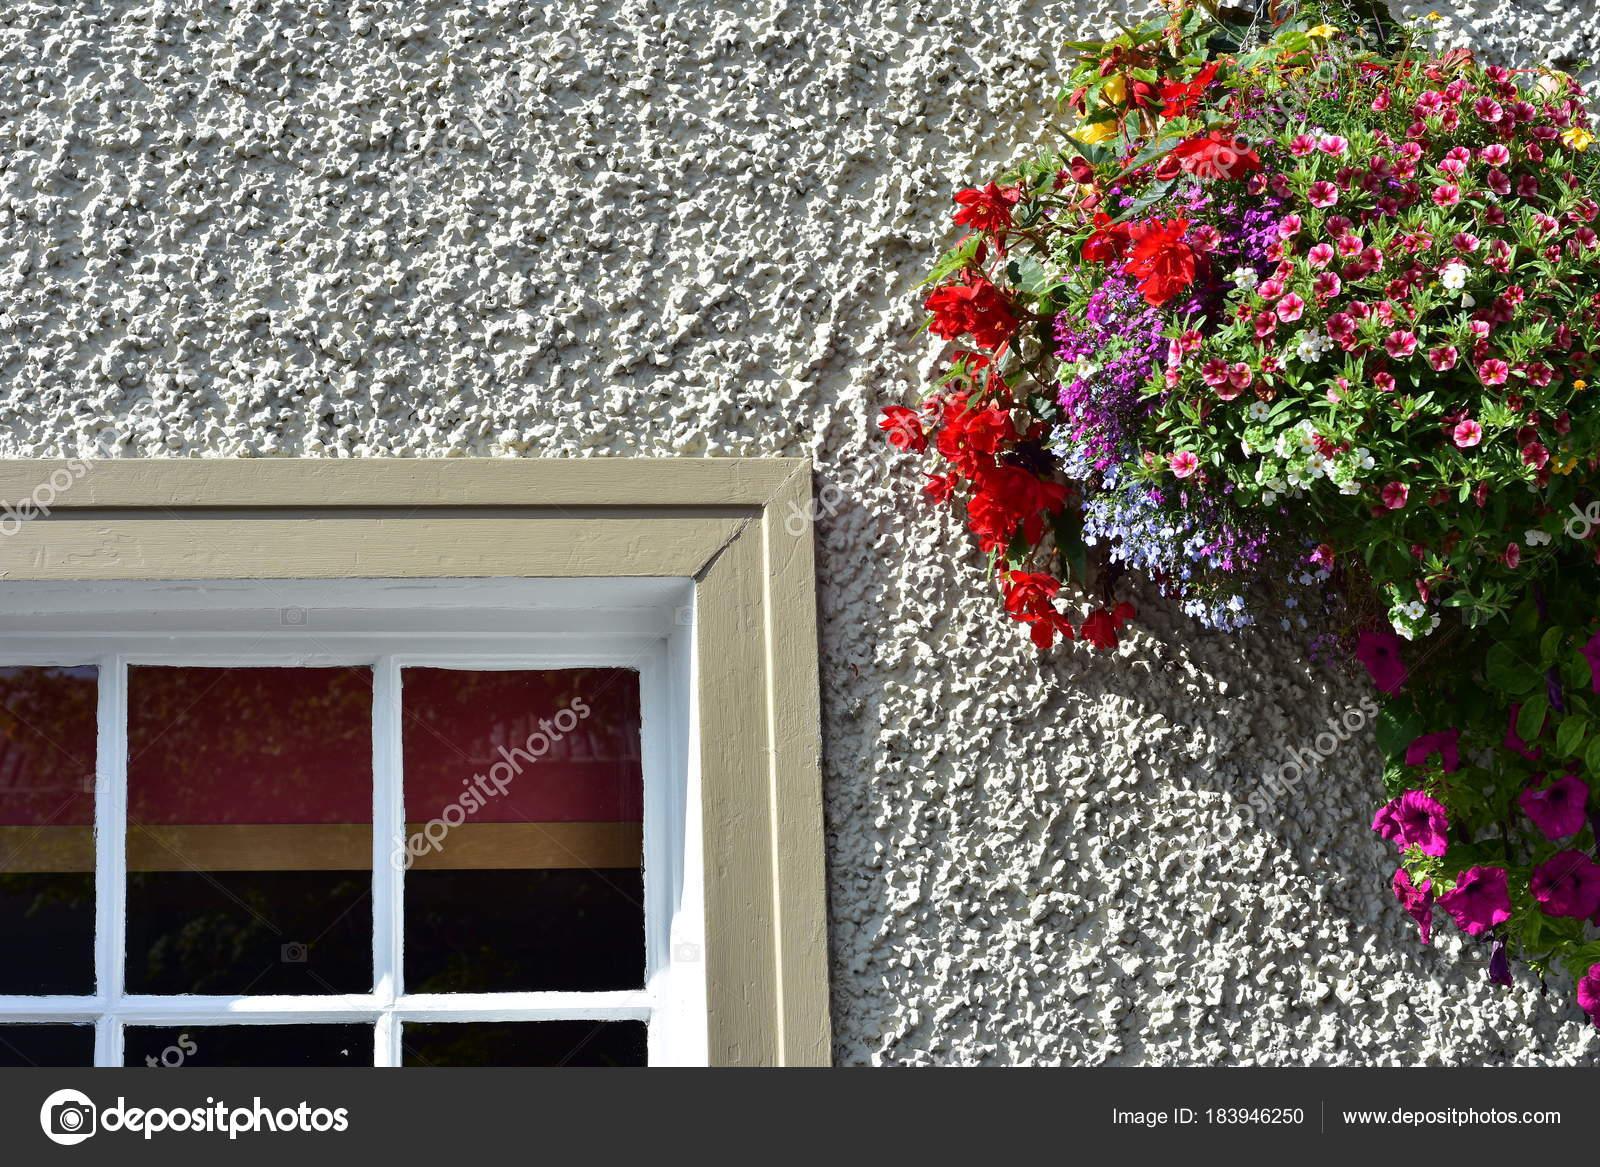 Flores Colores Colgando Pared Exterior Blanca Neta Marco Madera Del ...